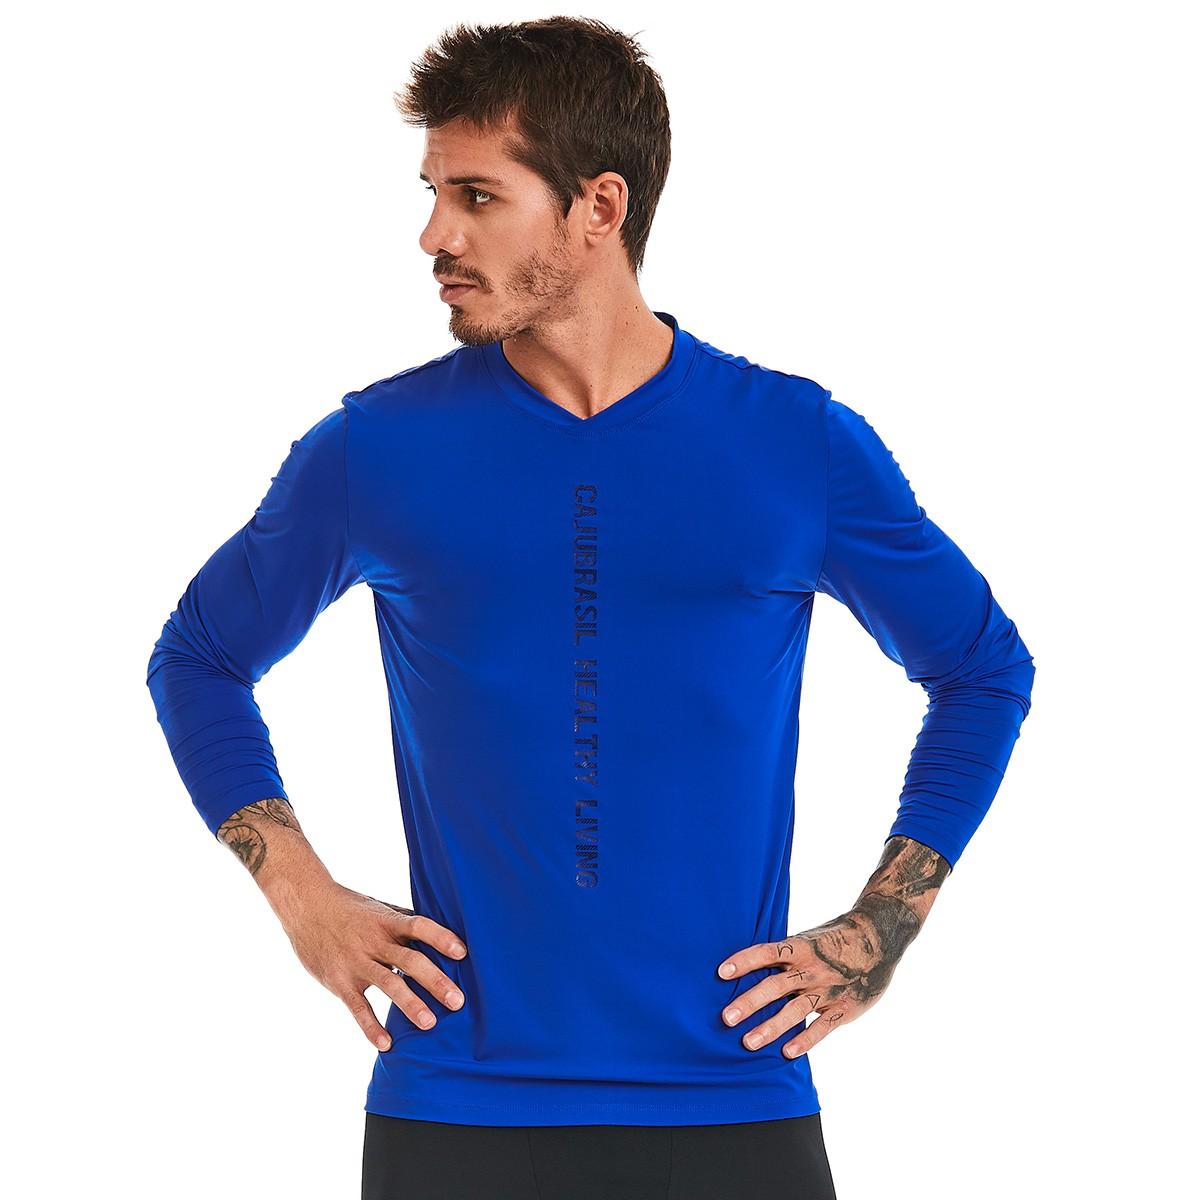 Camiseta Masculina Manga Longa Azul CAJUBRASIL Activewear aae8ae69d247a